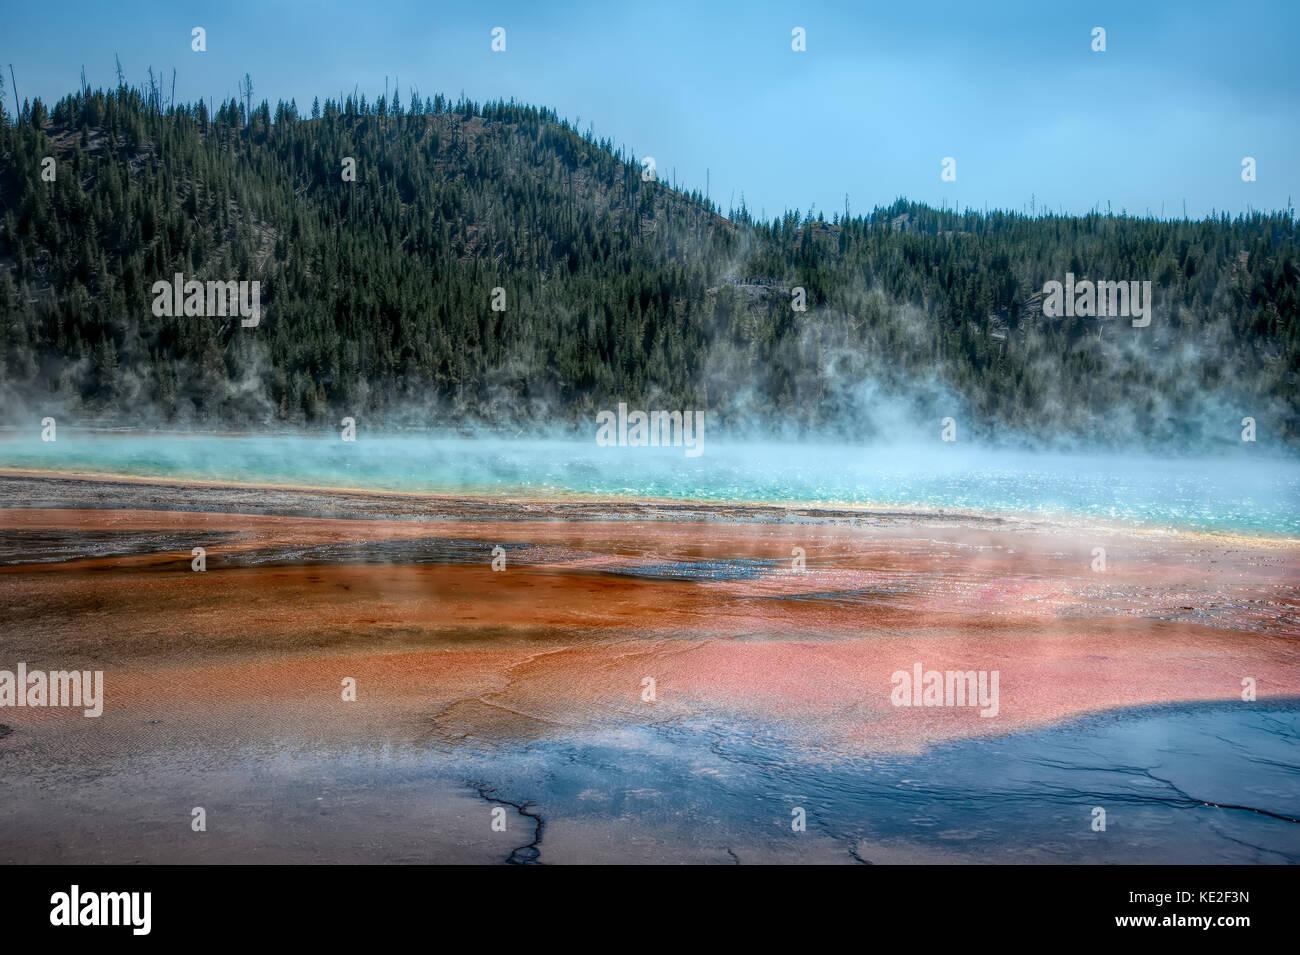 August 22, 2017 - Grand Prismatic Spring, Yellowstone National Park Stockbild